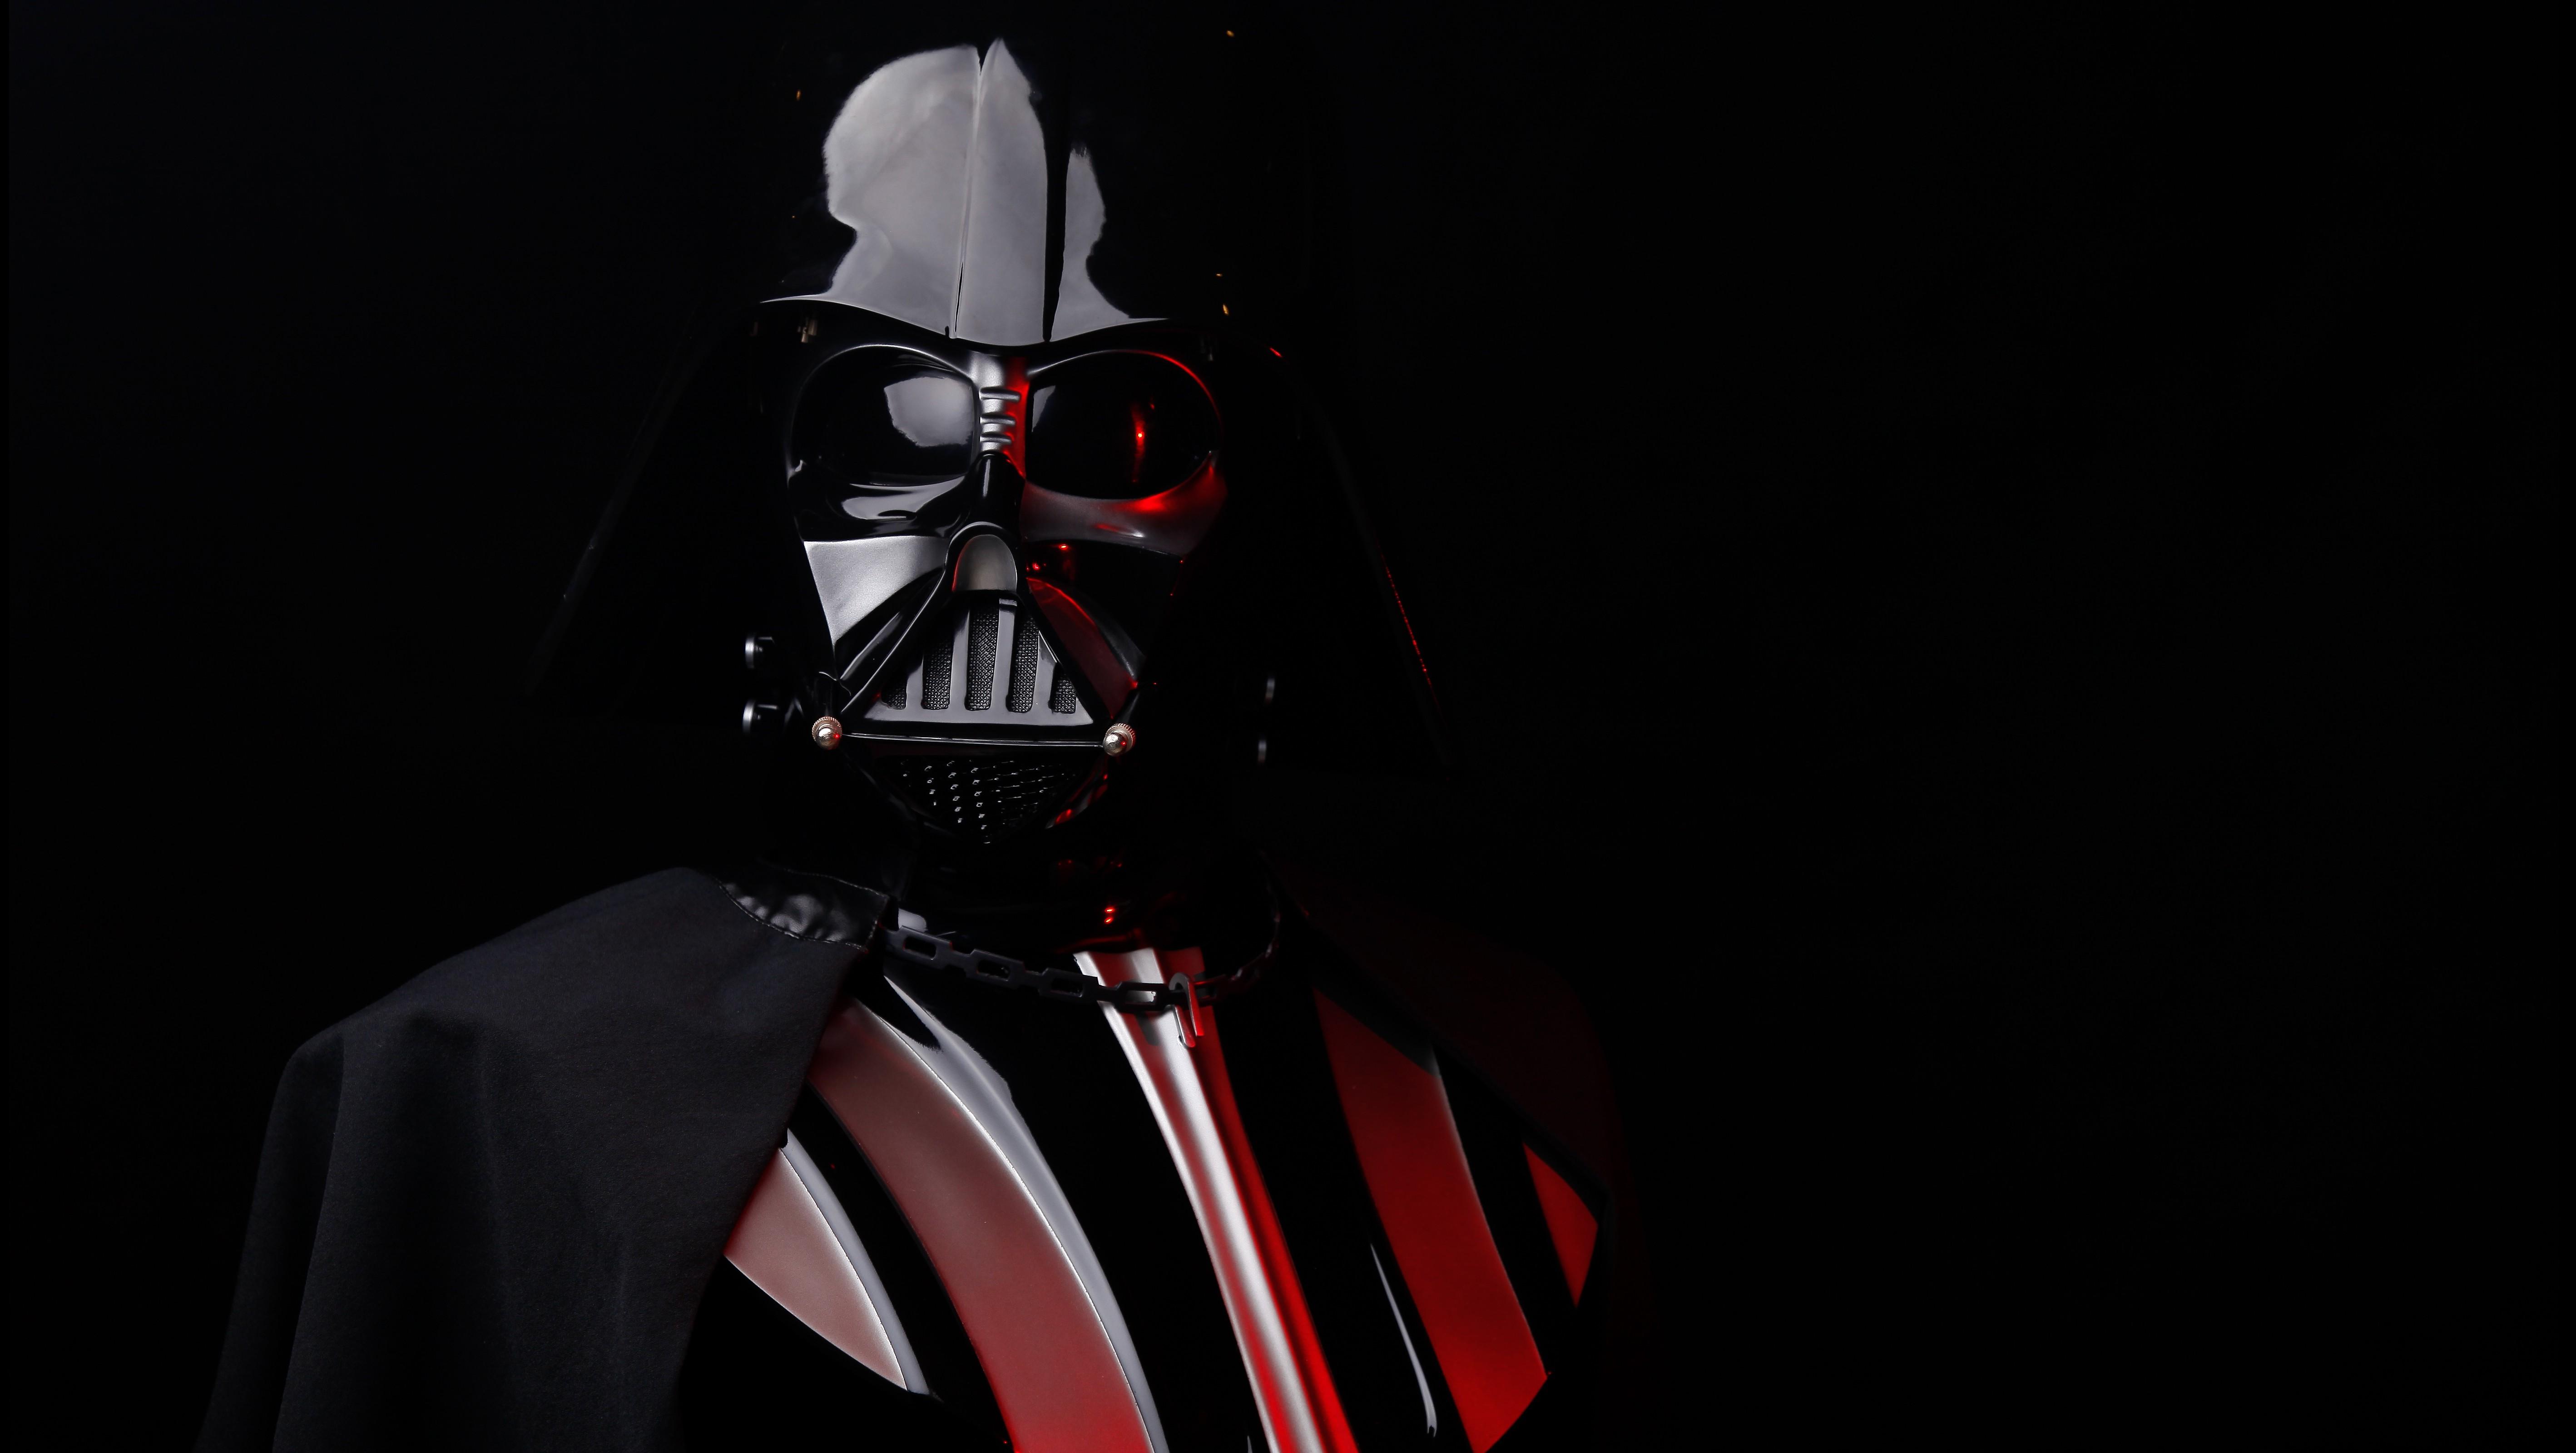 Dark Vader Wallpaper Posted By Zoey Walker